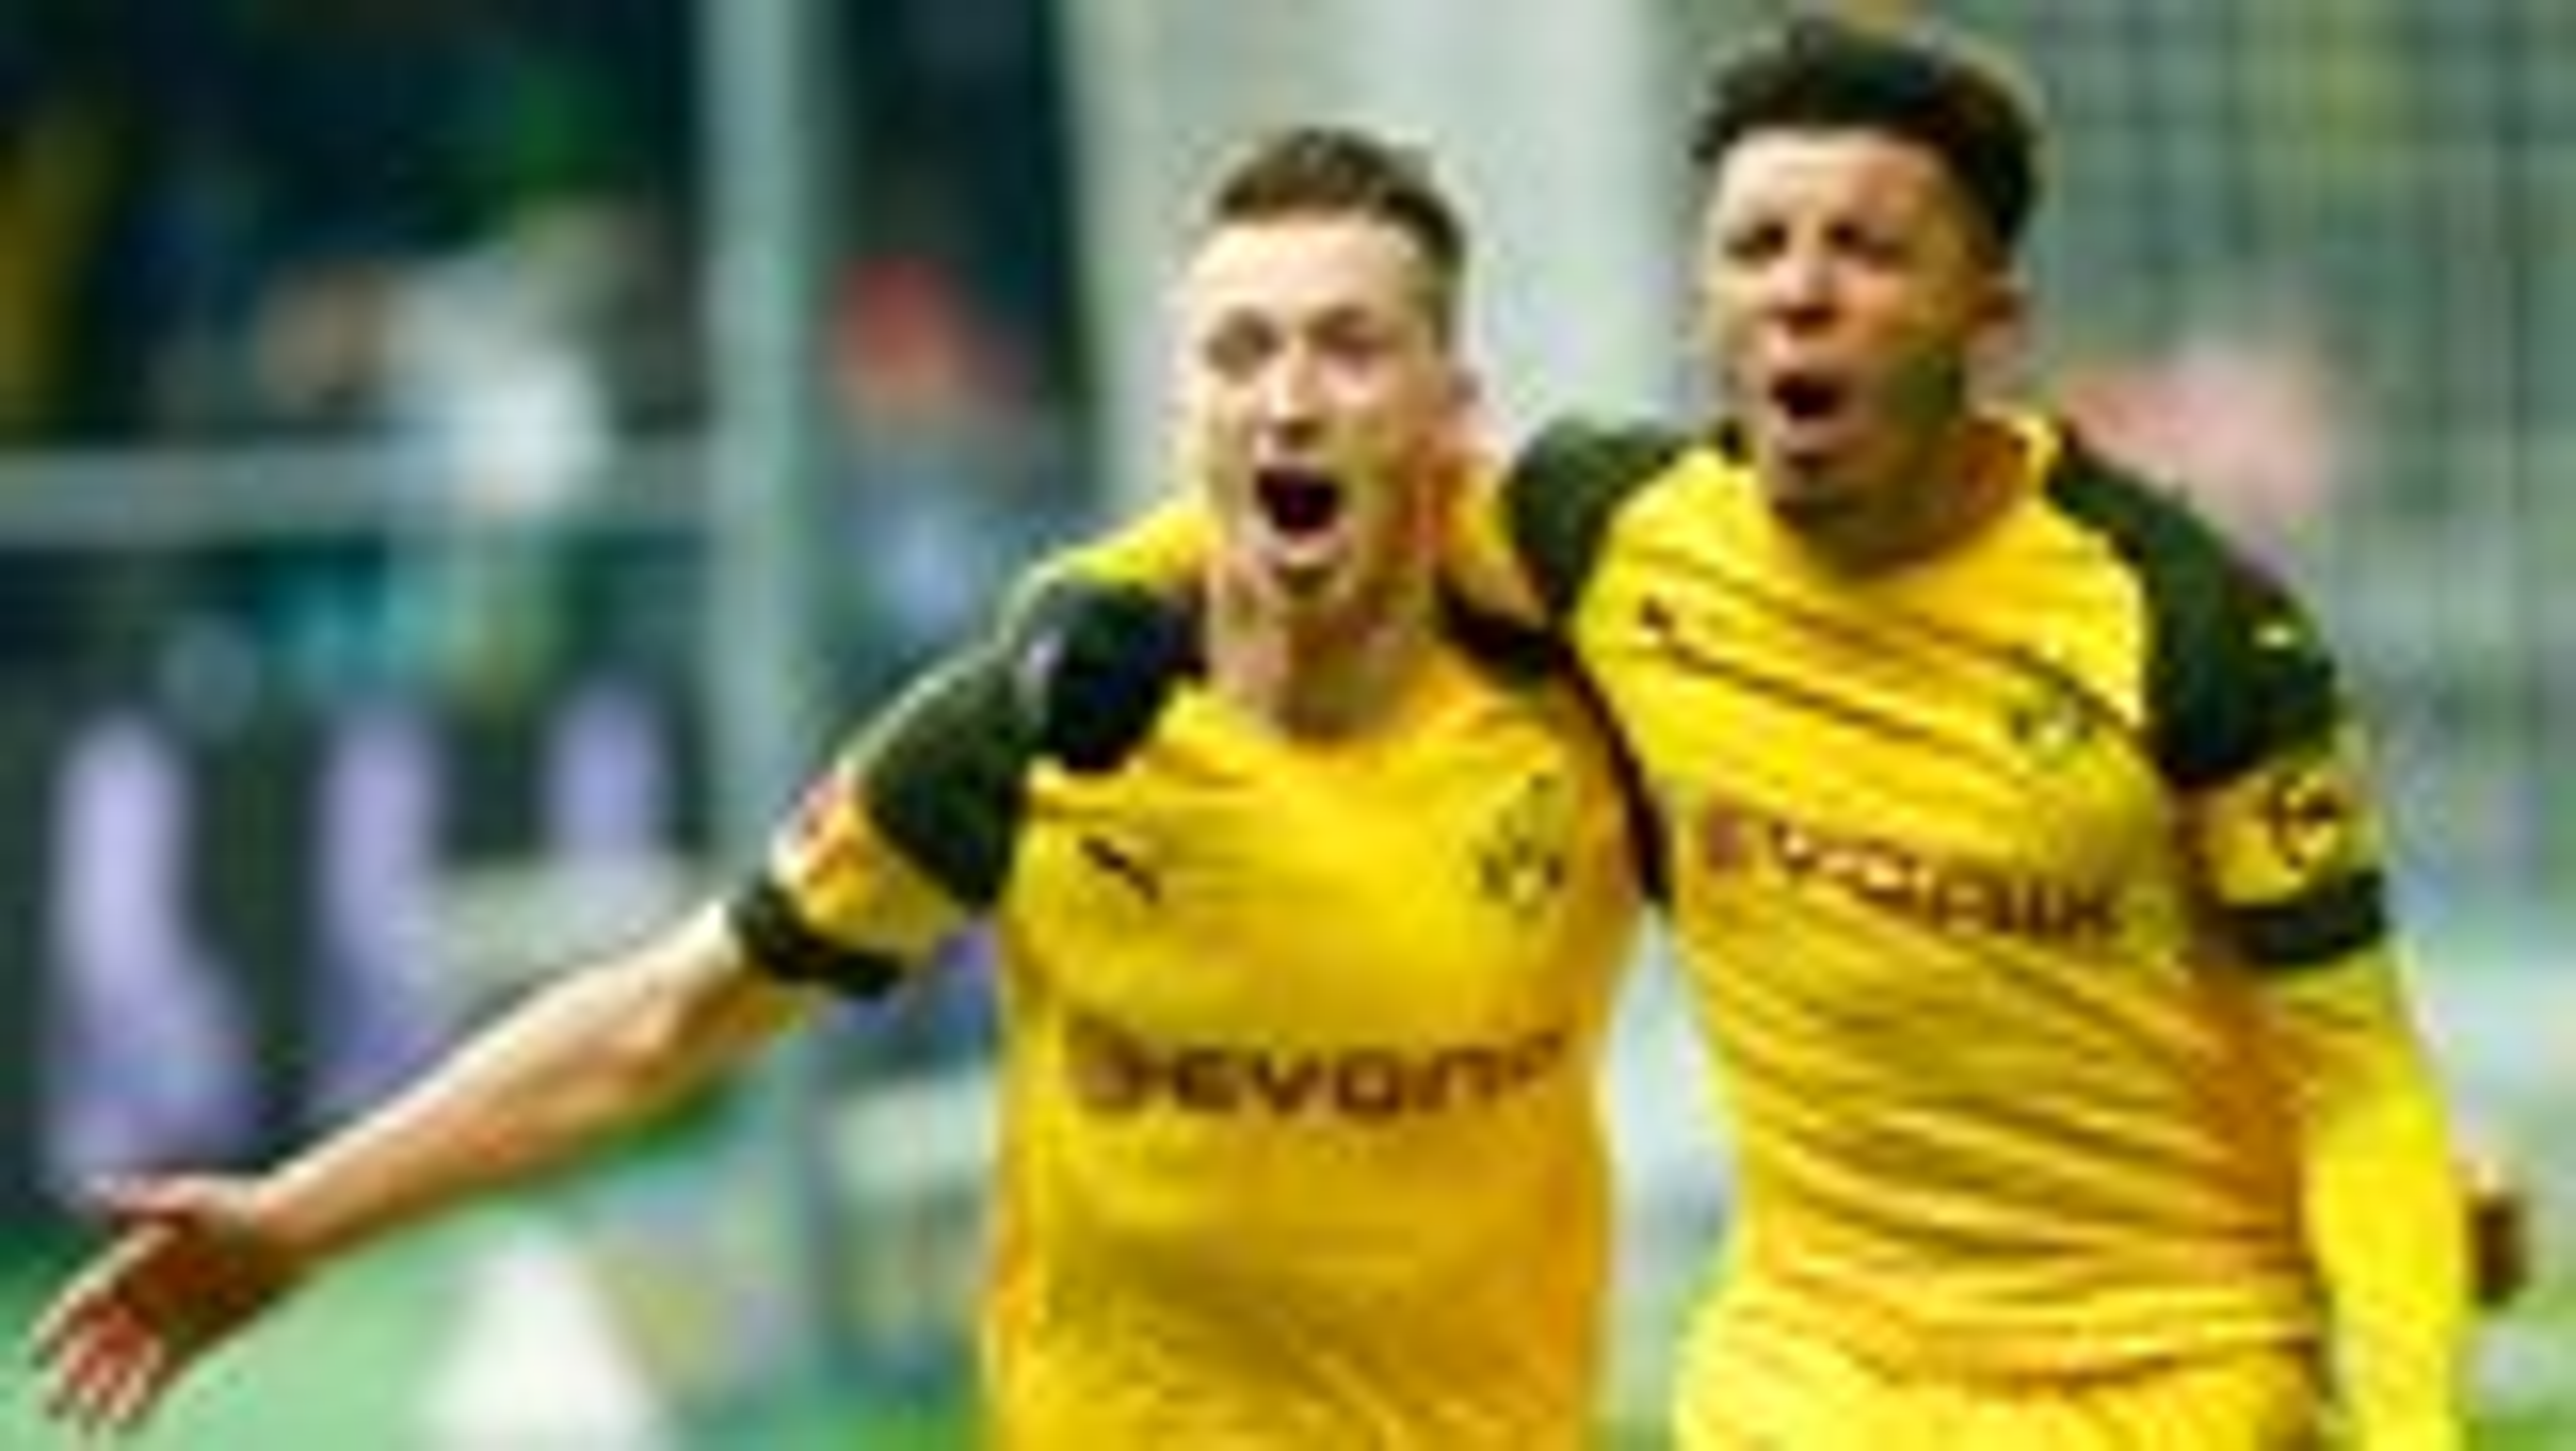 Dortmund stay level with Bayern after Reus stuns Hertha